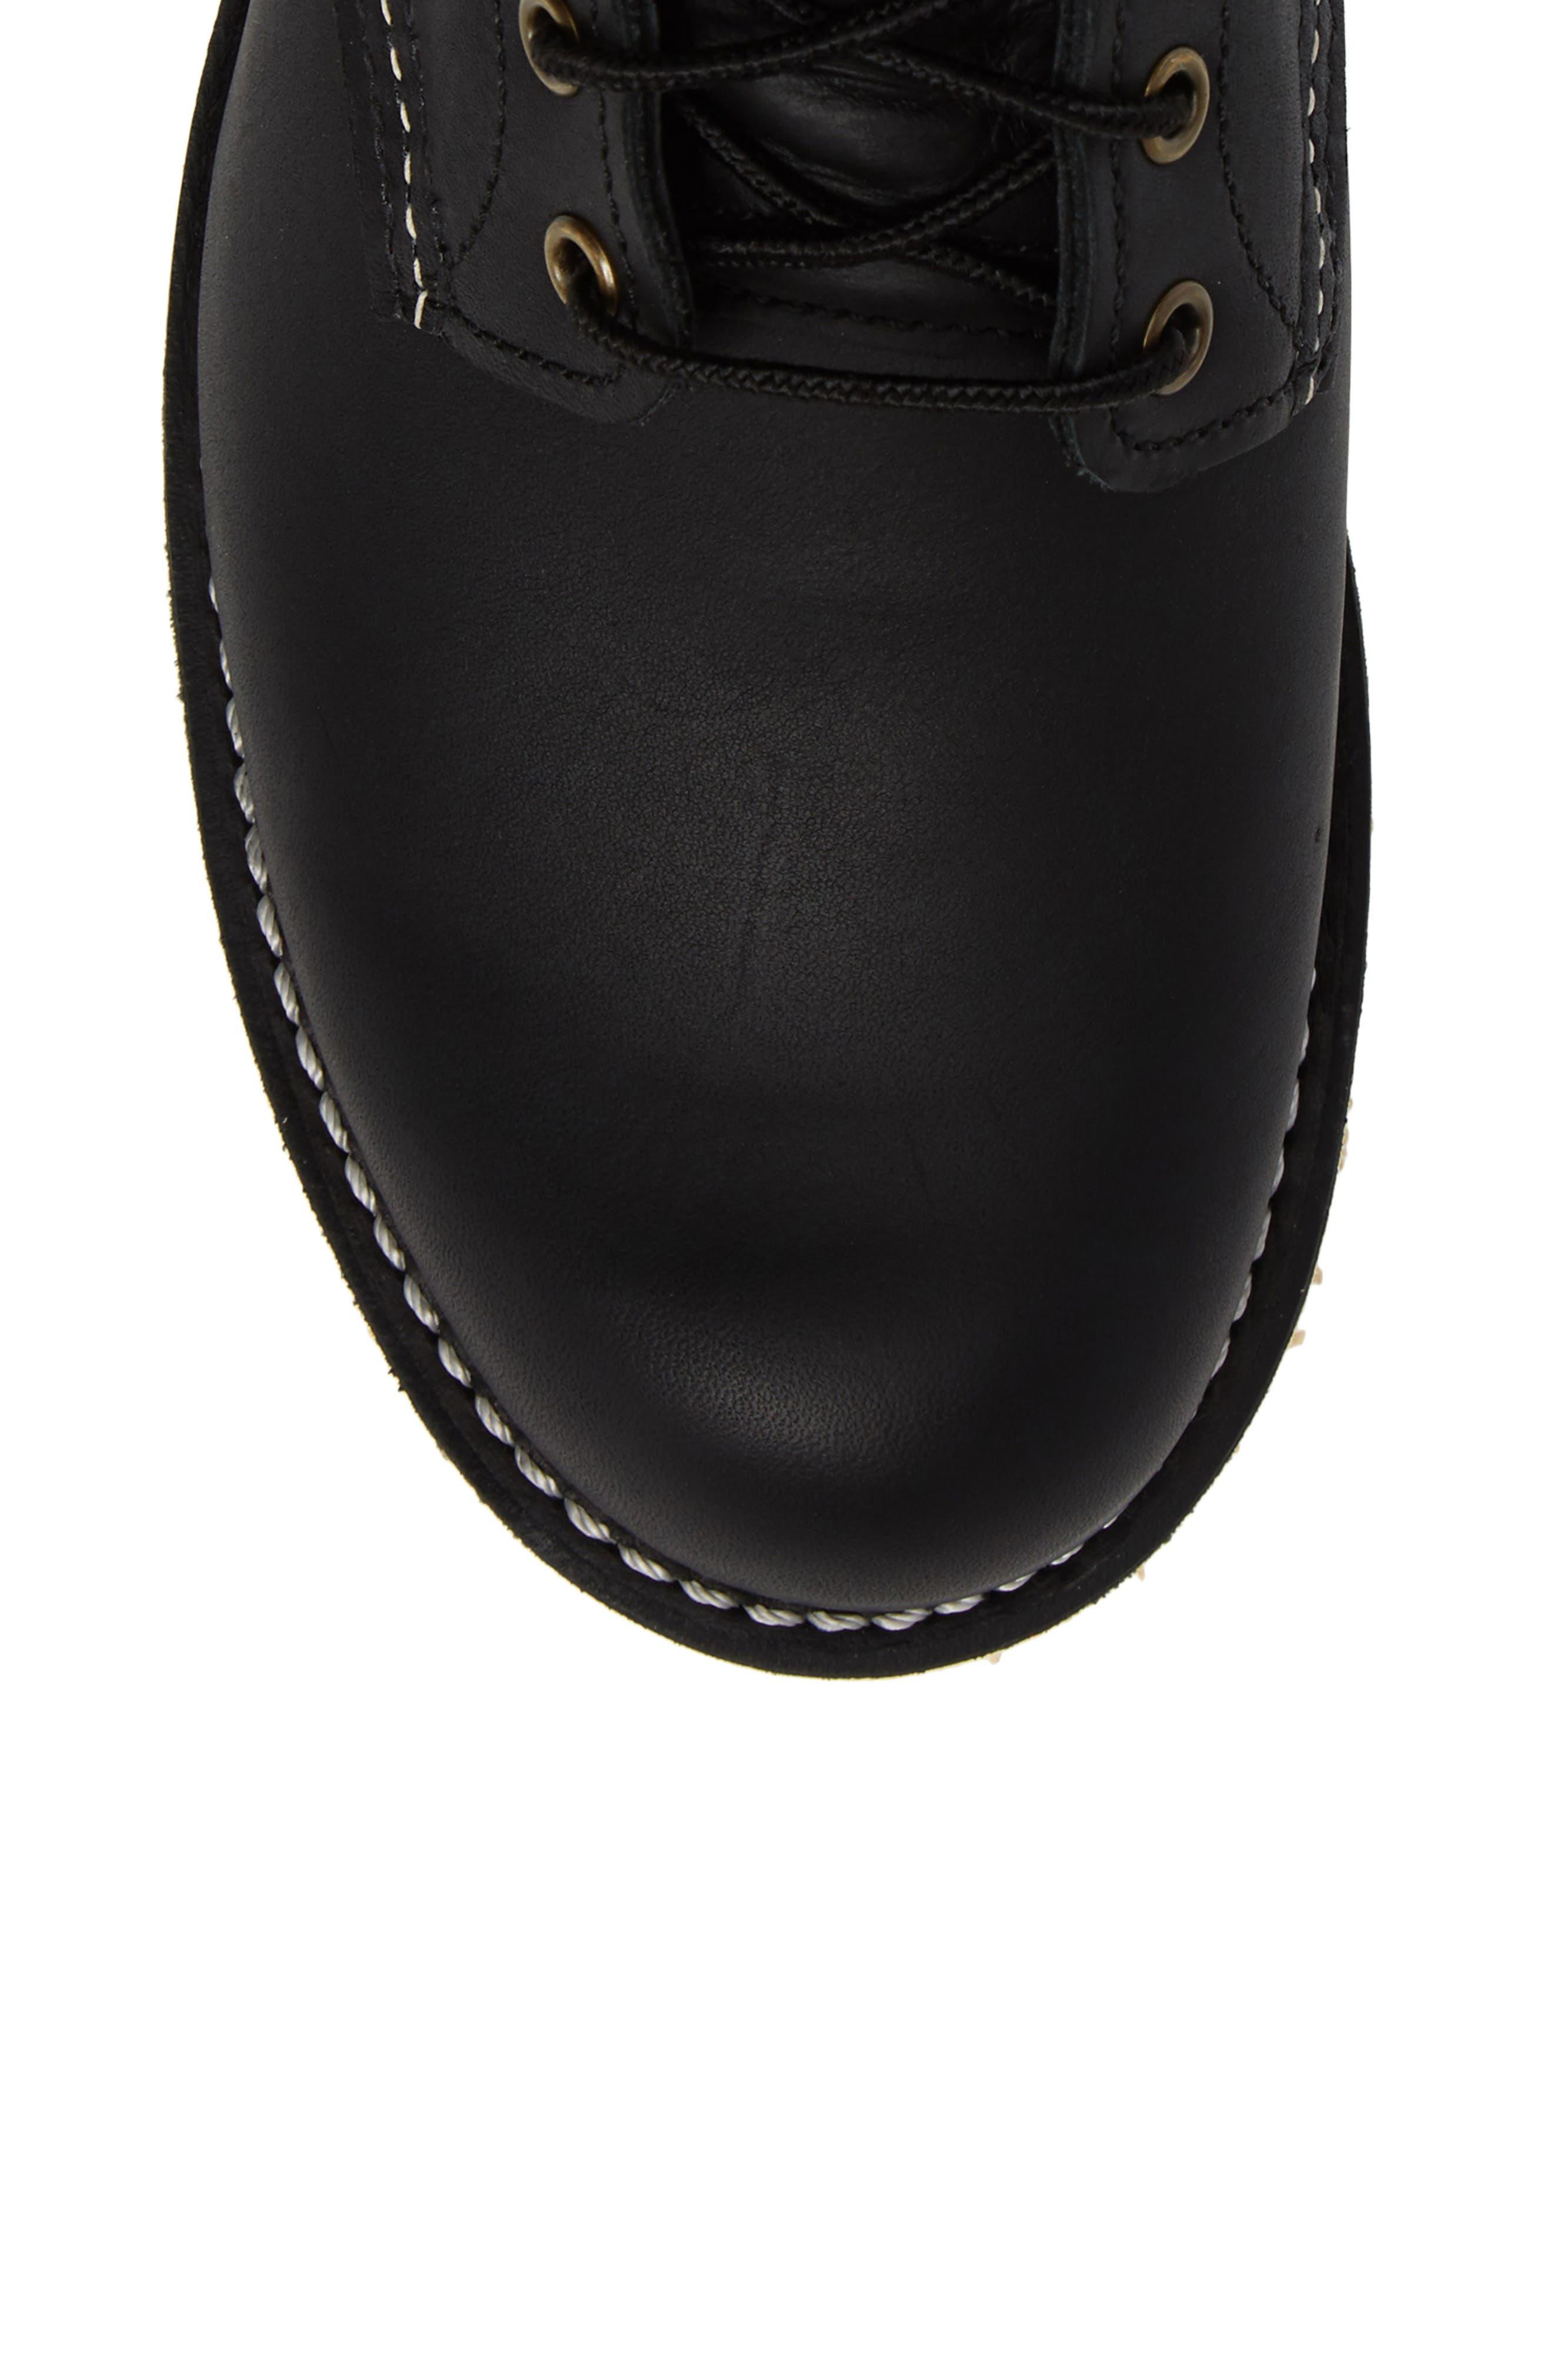 Rover Plain Toe Boot,                             Alternate thumbnail 5, color,                             BLACK HARNESS LEATHER